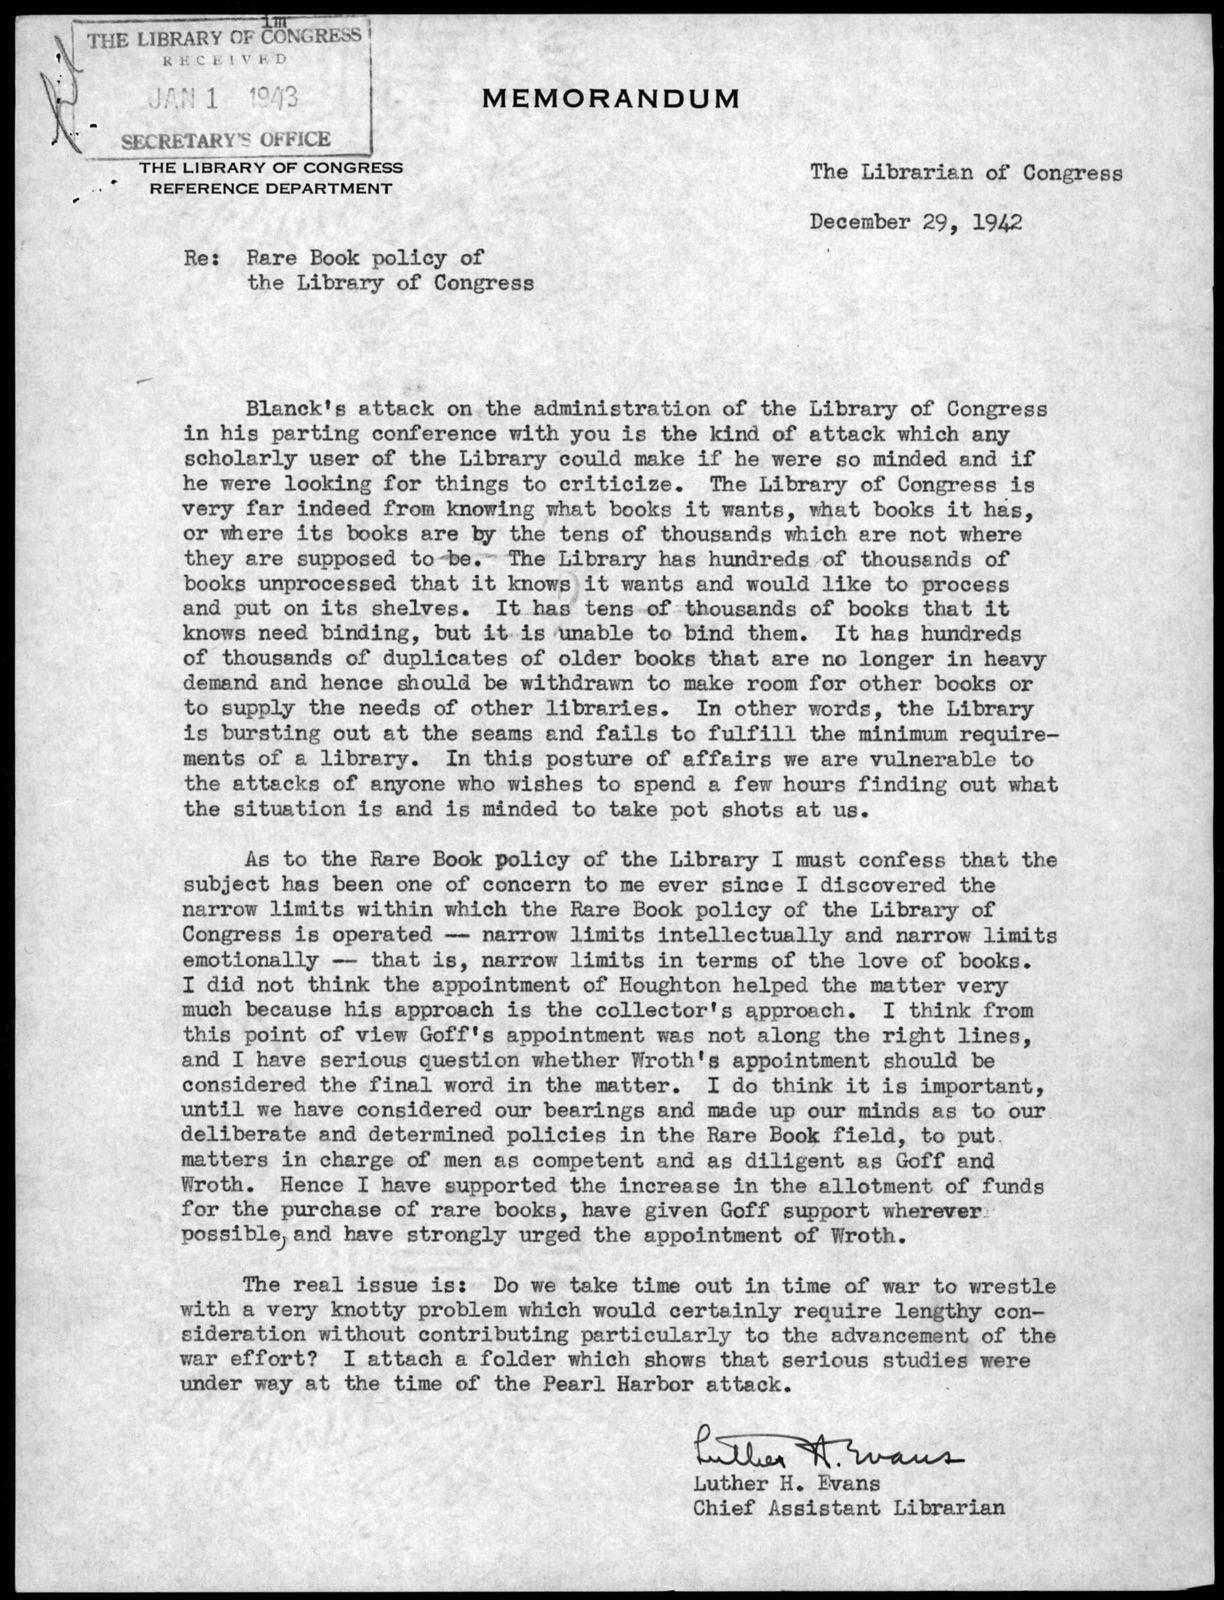 Memorandum from Luther Harris Evans to Archibald MacLeish, December 29, 1942